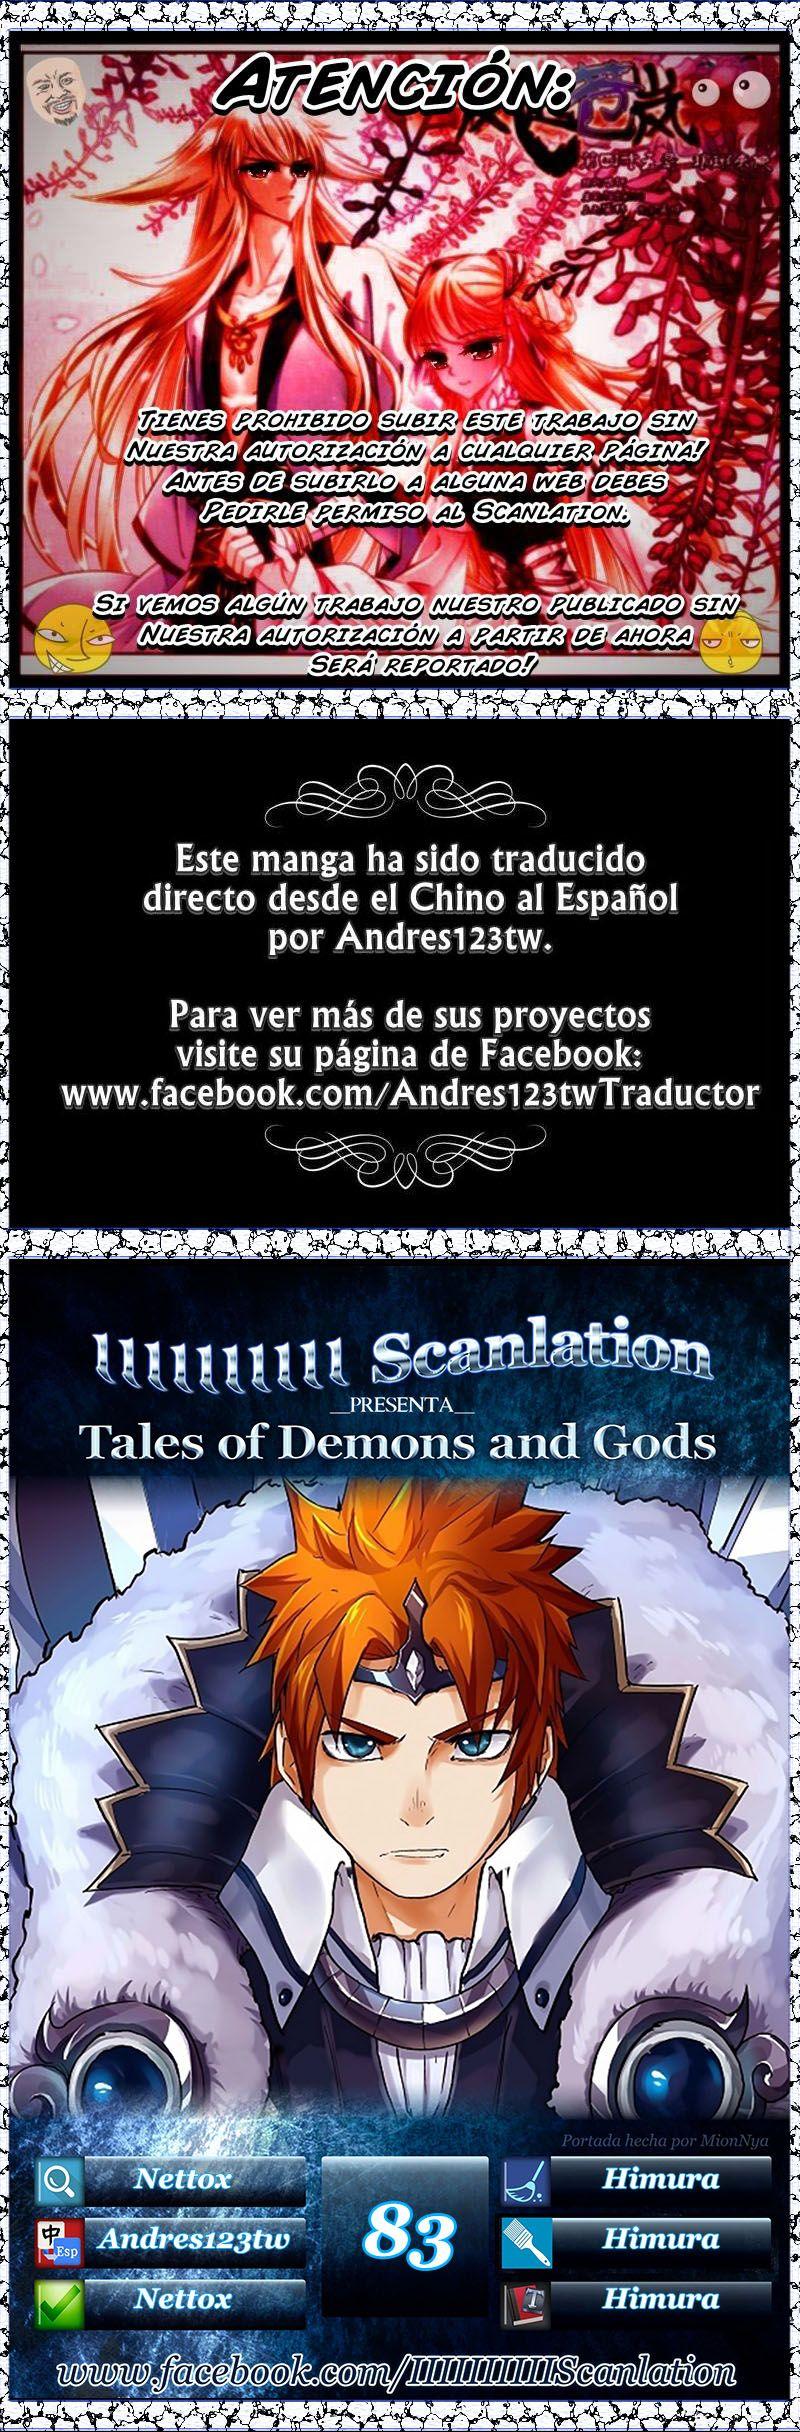 http://c5.ninemanga.com/es_manga/7/17735/467484/9bb8be91ac7cff3add9a0def2fbba4f0.jpg Page 1